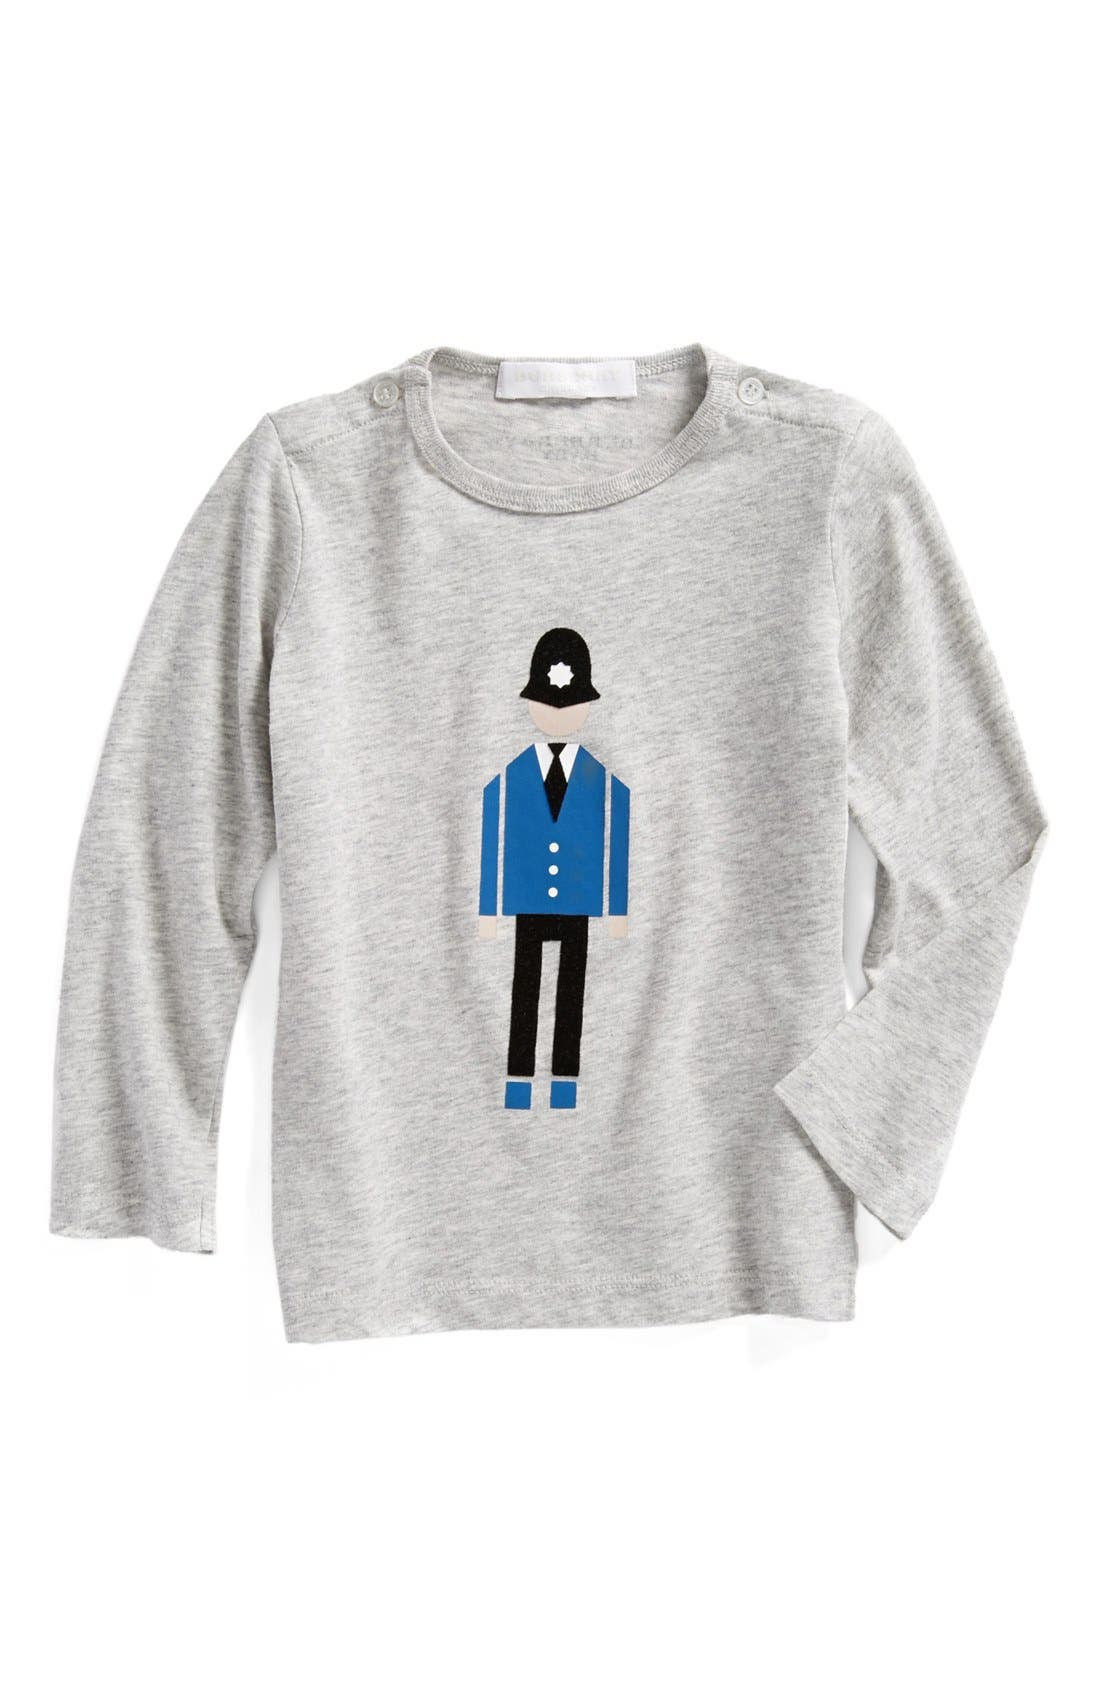 Main Image - Burberry Long Sleeve T-Shirt (Toddler)